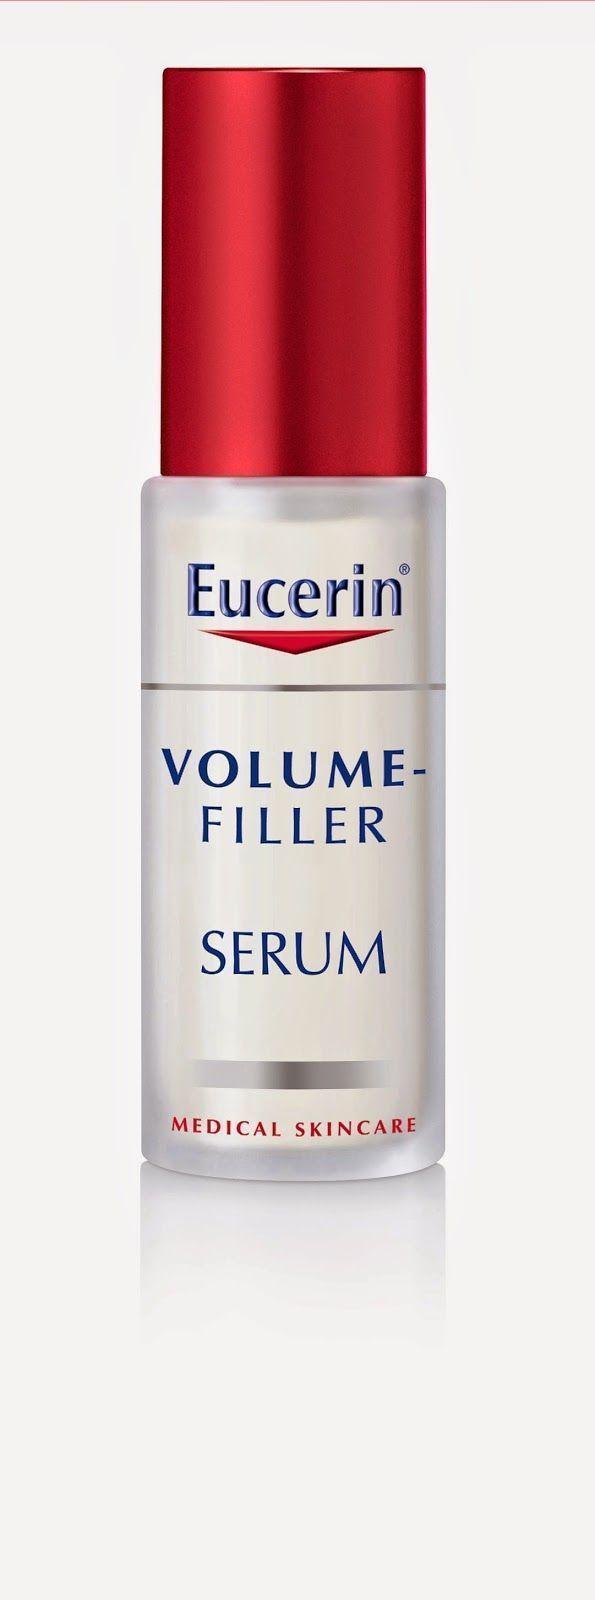 volume filler serum de eucerin un 10 en belleza. Black Bedroom Furniture Sets. Home Design Ideas